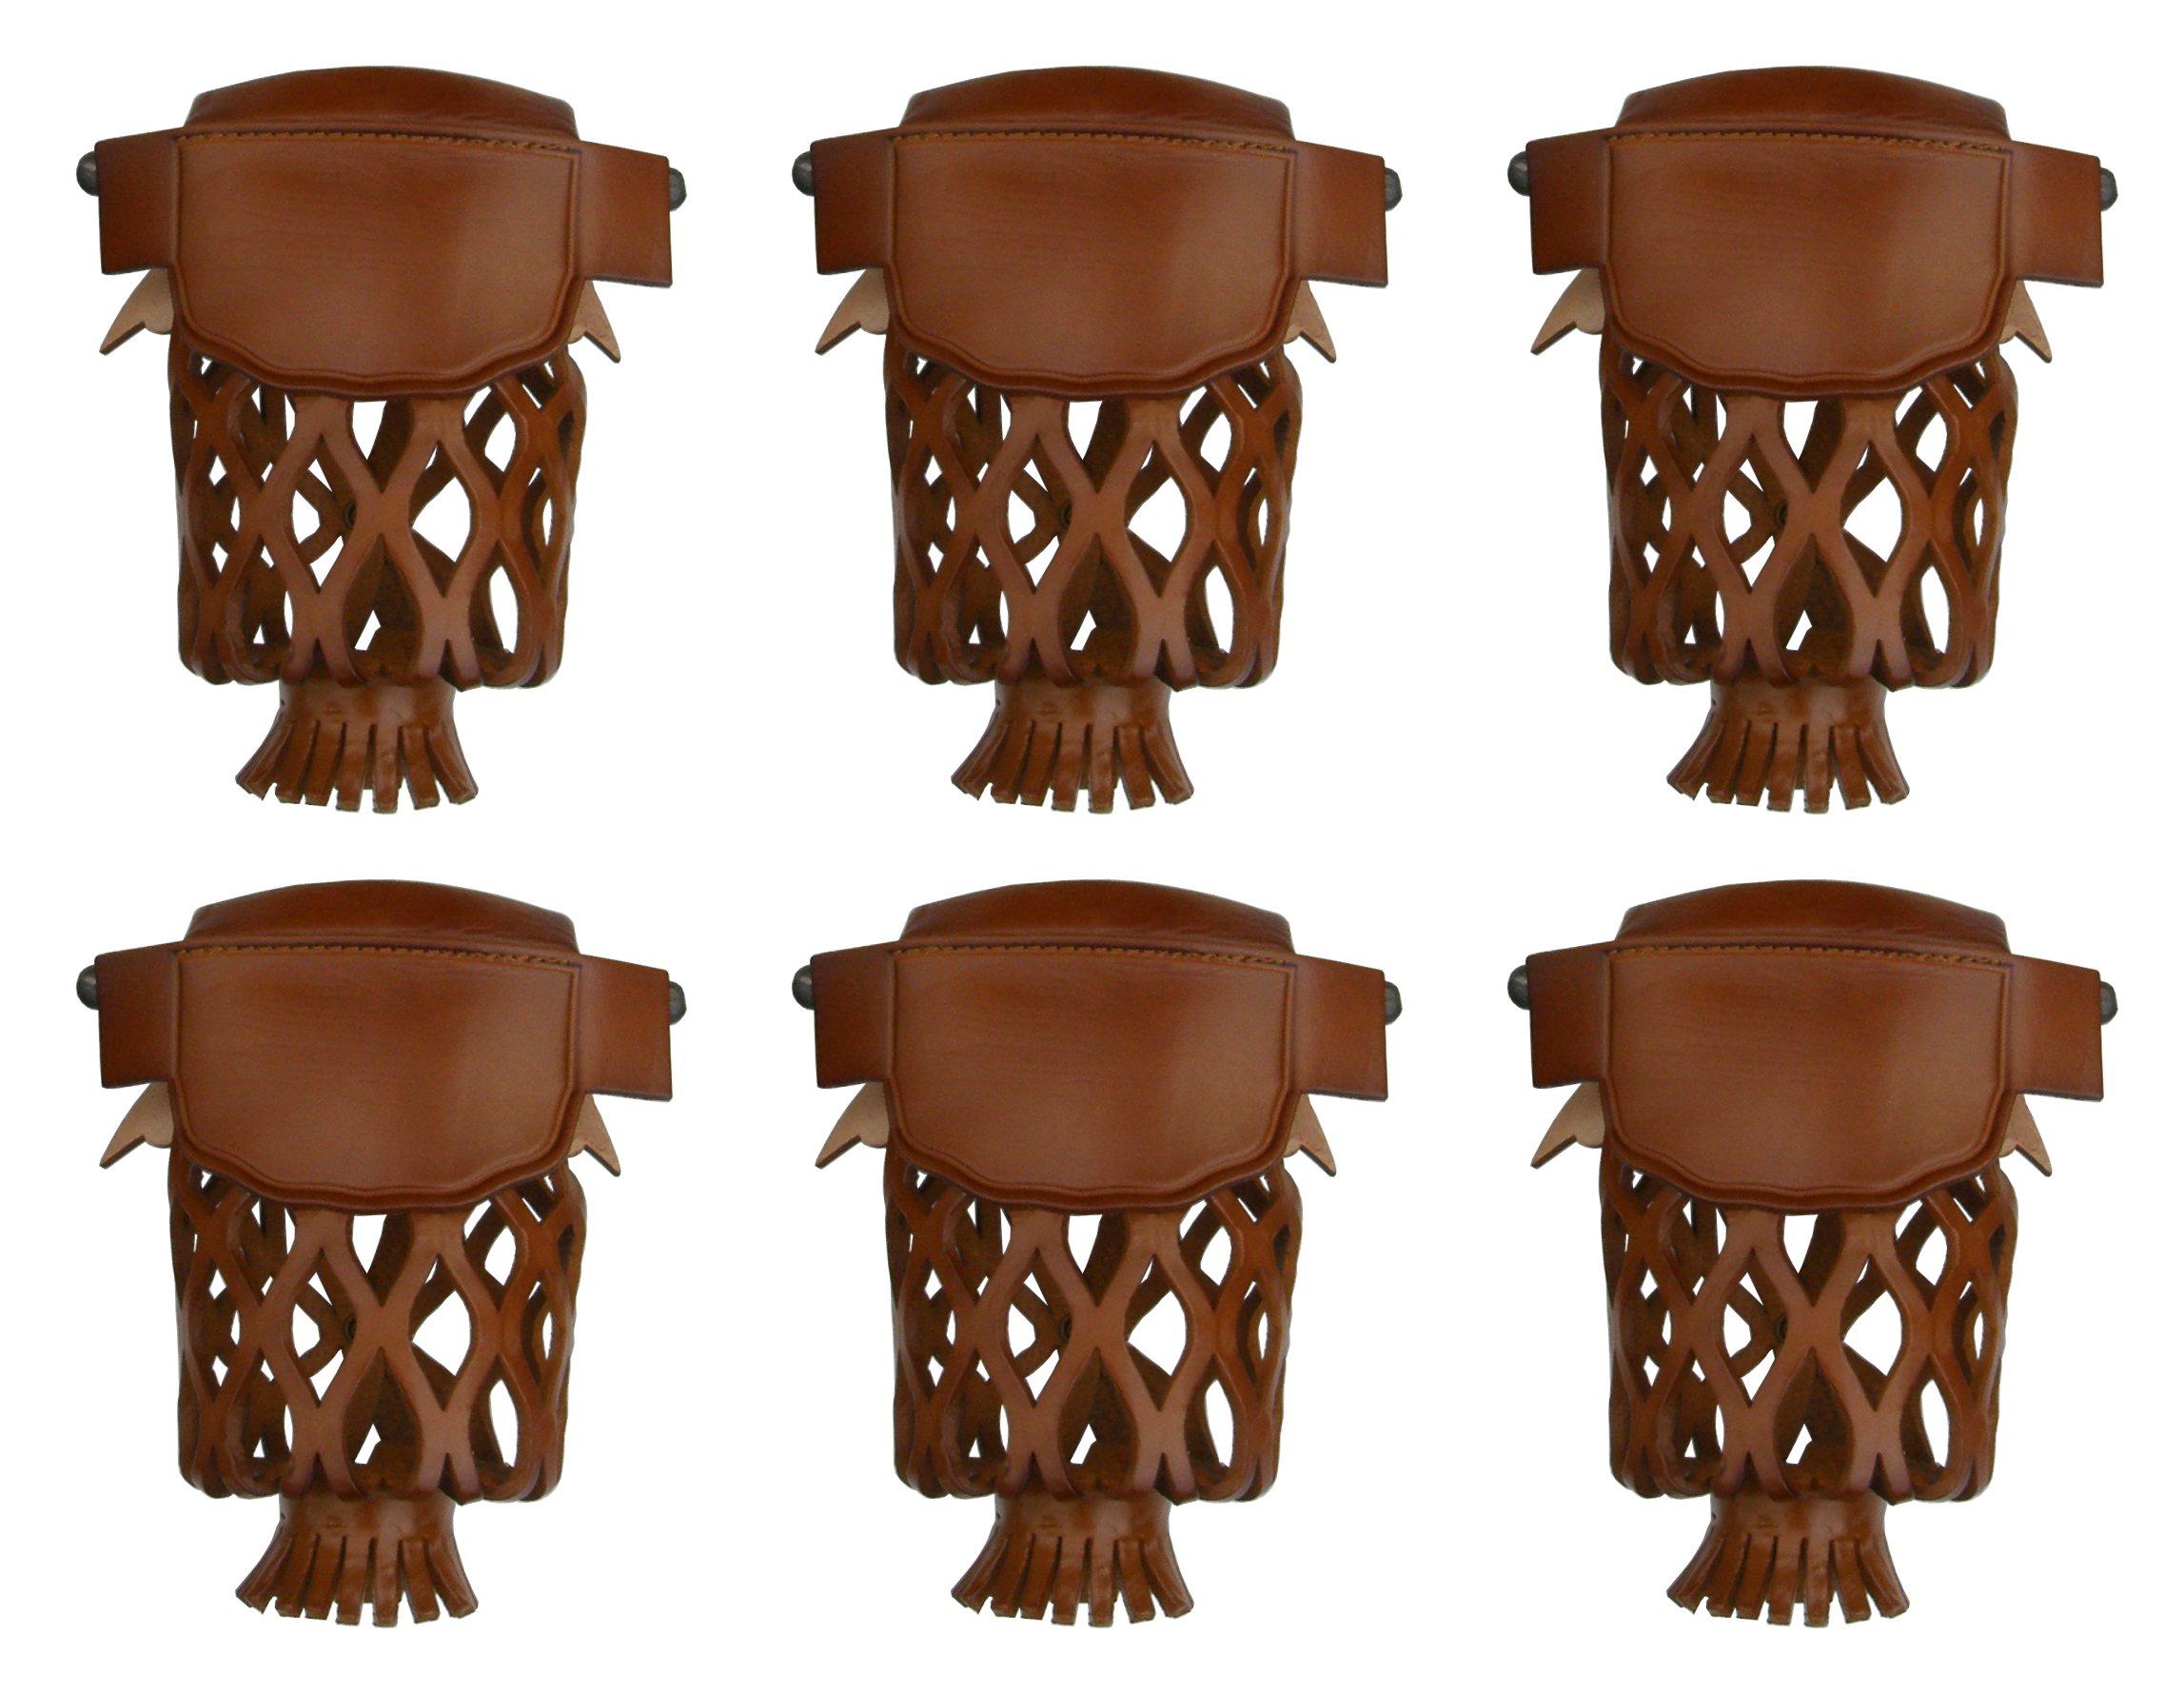 Iszy Billiards Iron Pool Table Billiard Pockets-Set of 6 (Caramel)